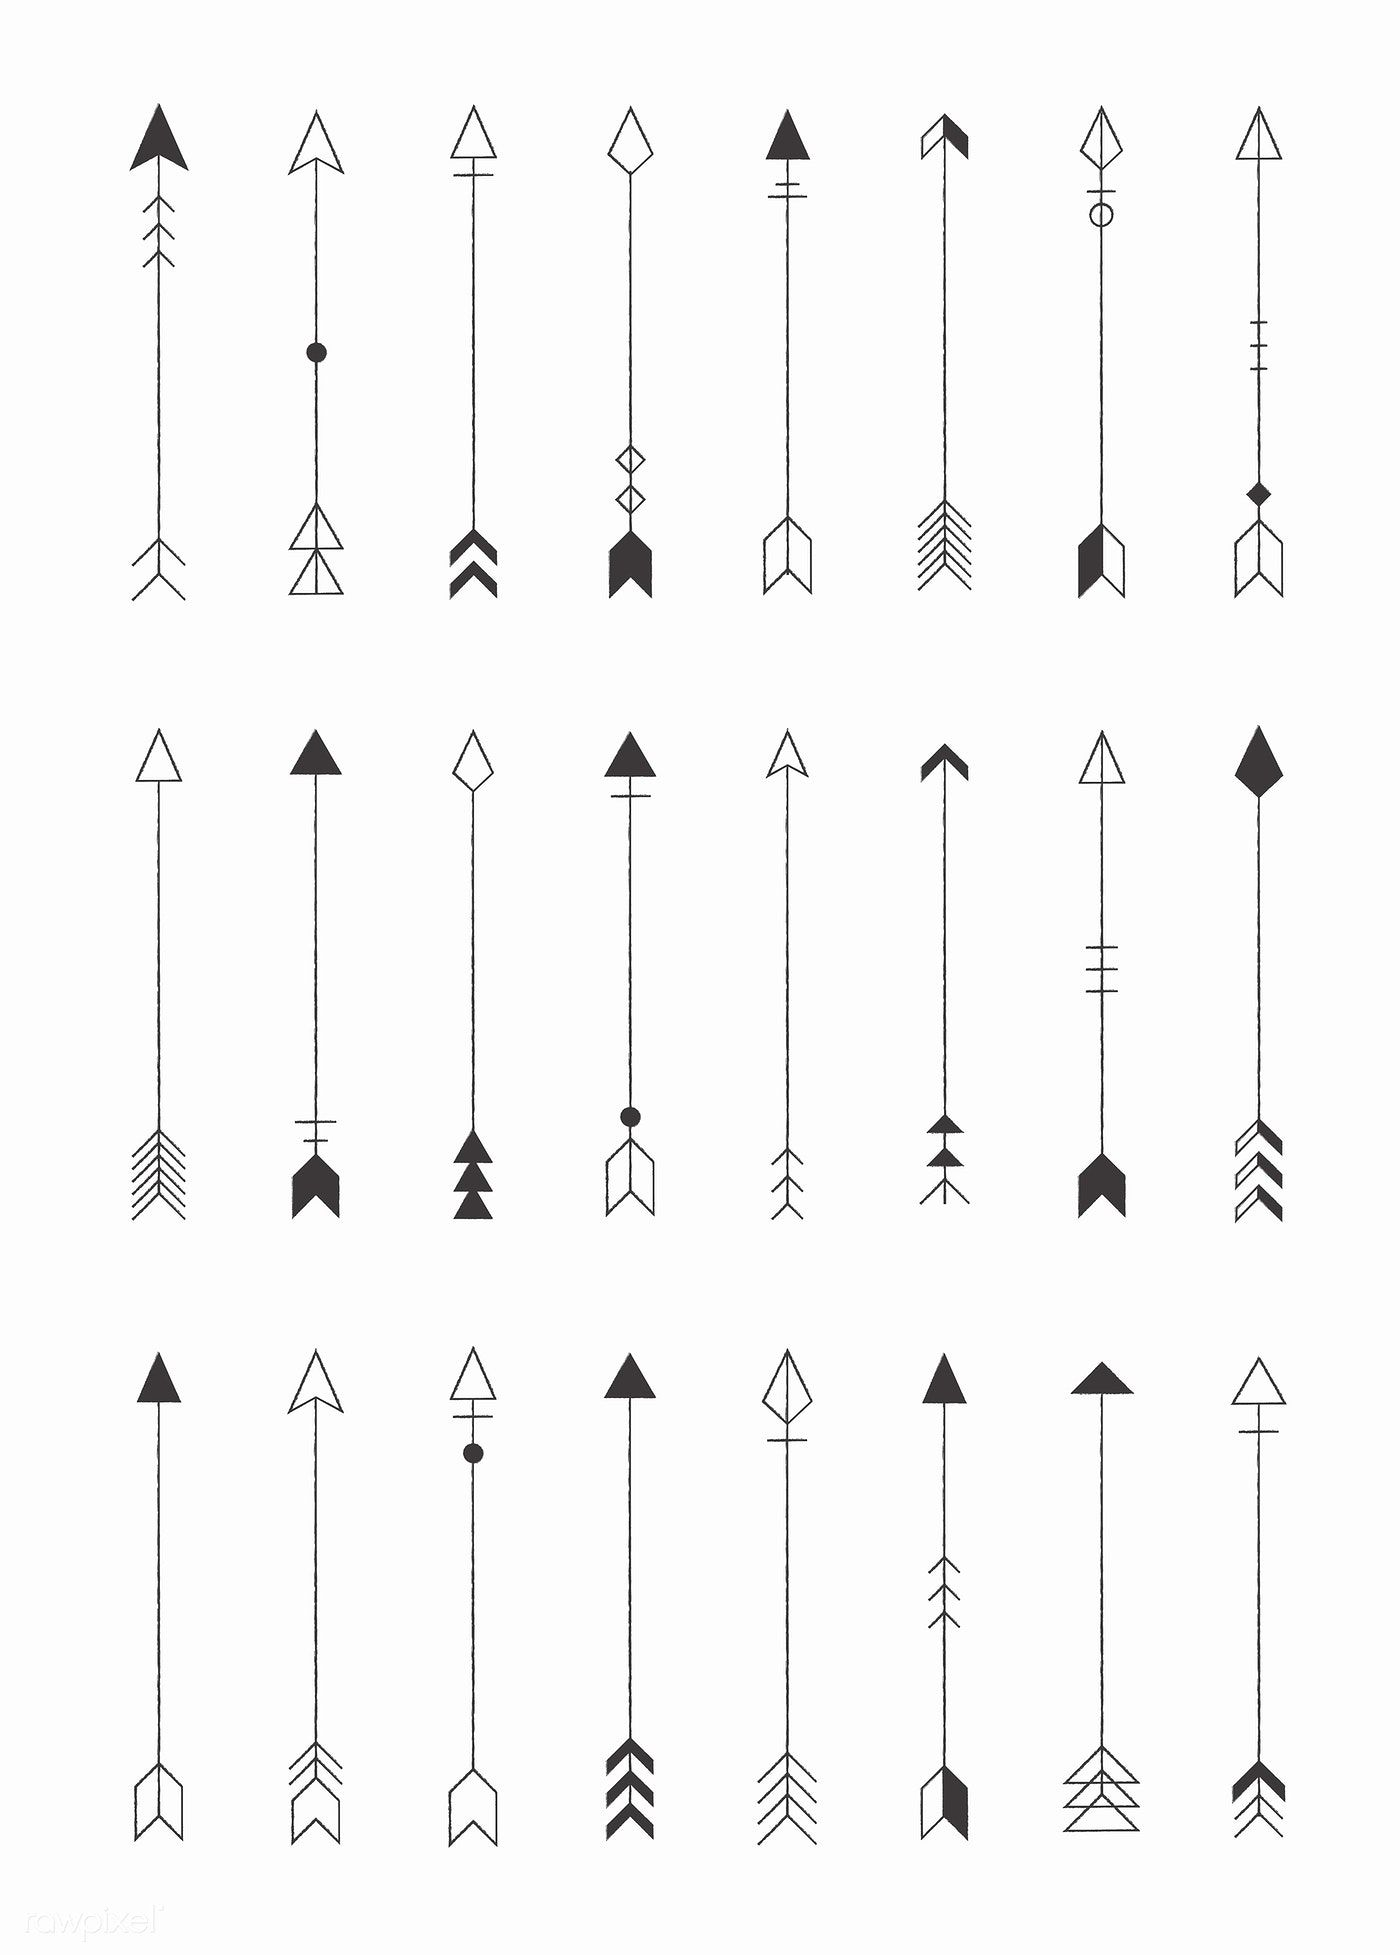 Hipster Arrows Collection Big Set Of Hand Drawn Hipster Arrows Set Of Indian Style Arrows Arrow For All Des Tatuajes Flechas Aries Tatuaje Tatuajes Hipster